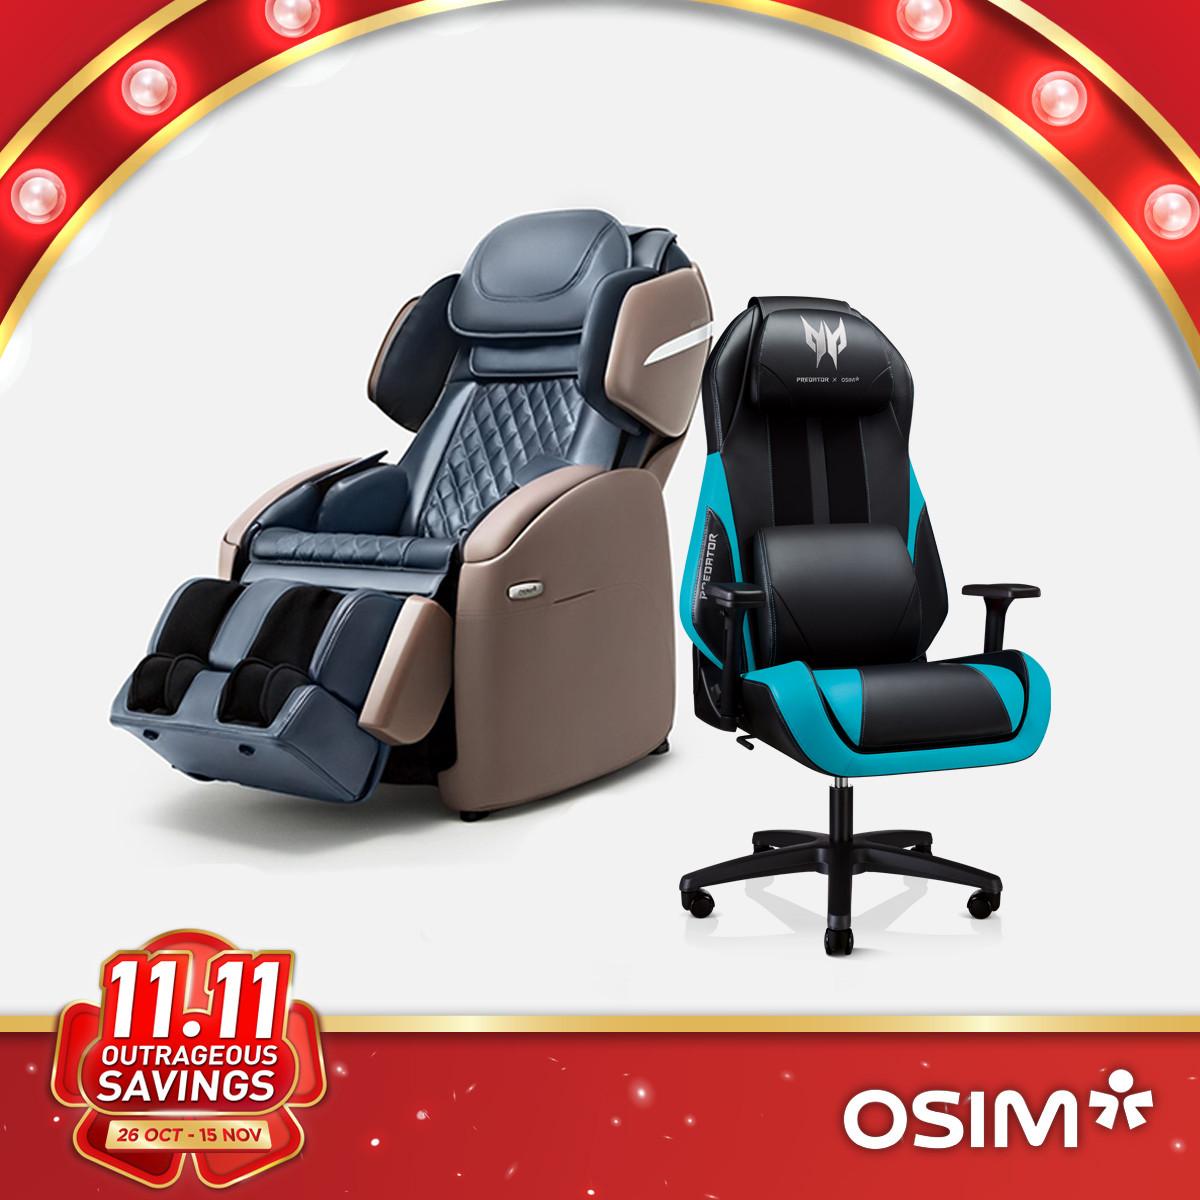 uNano Series + Predator Gaming Chair x OSIM